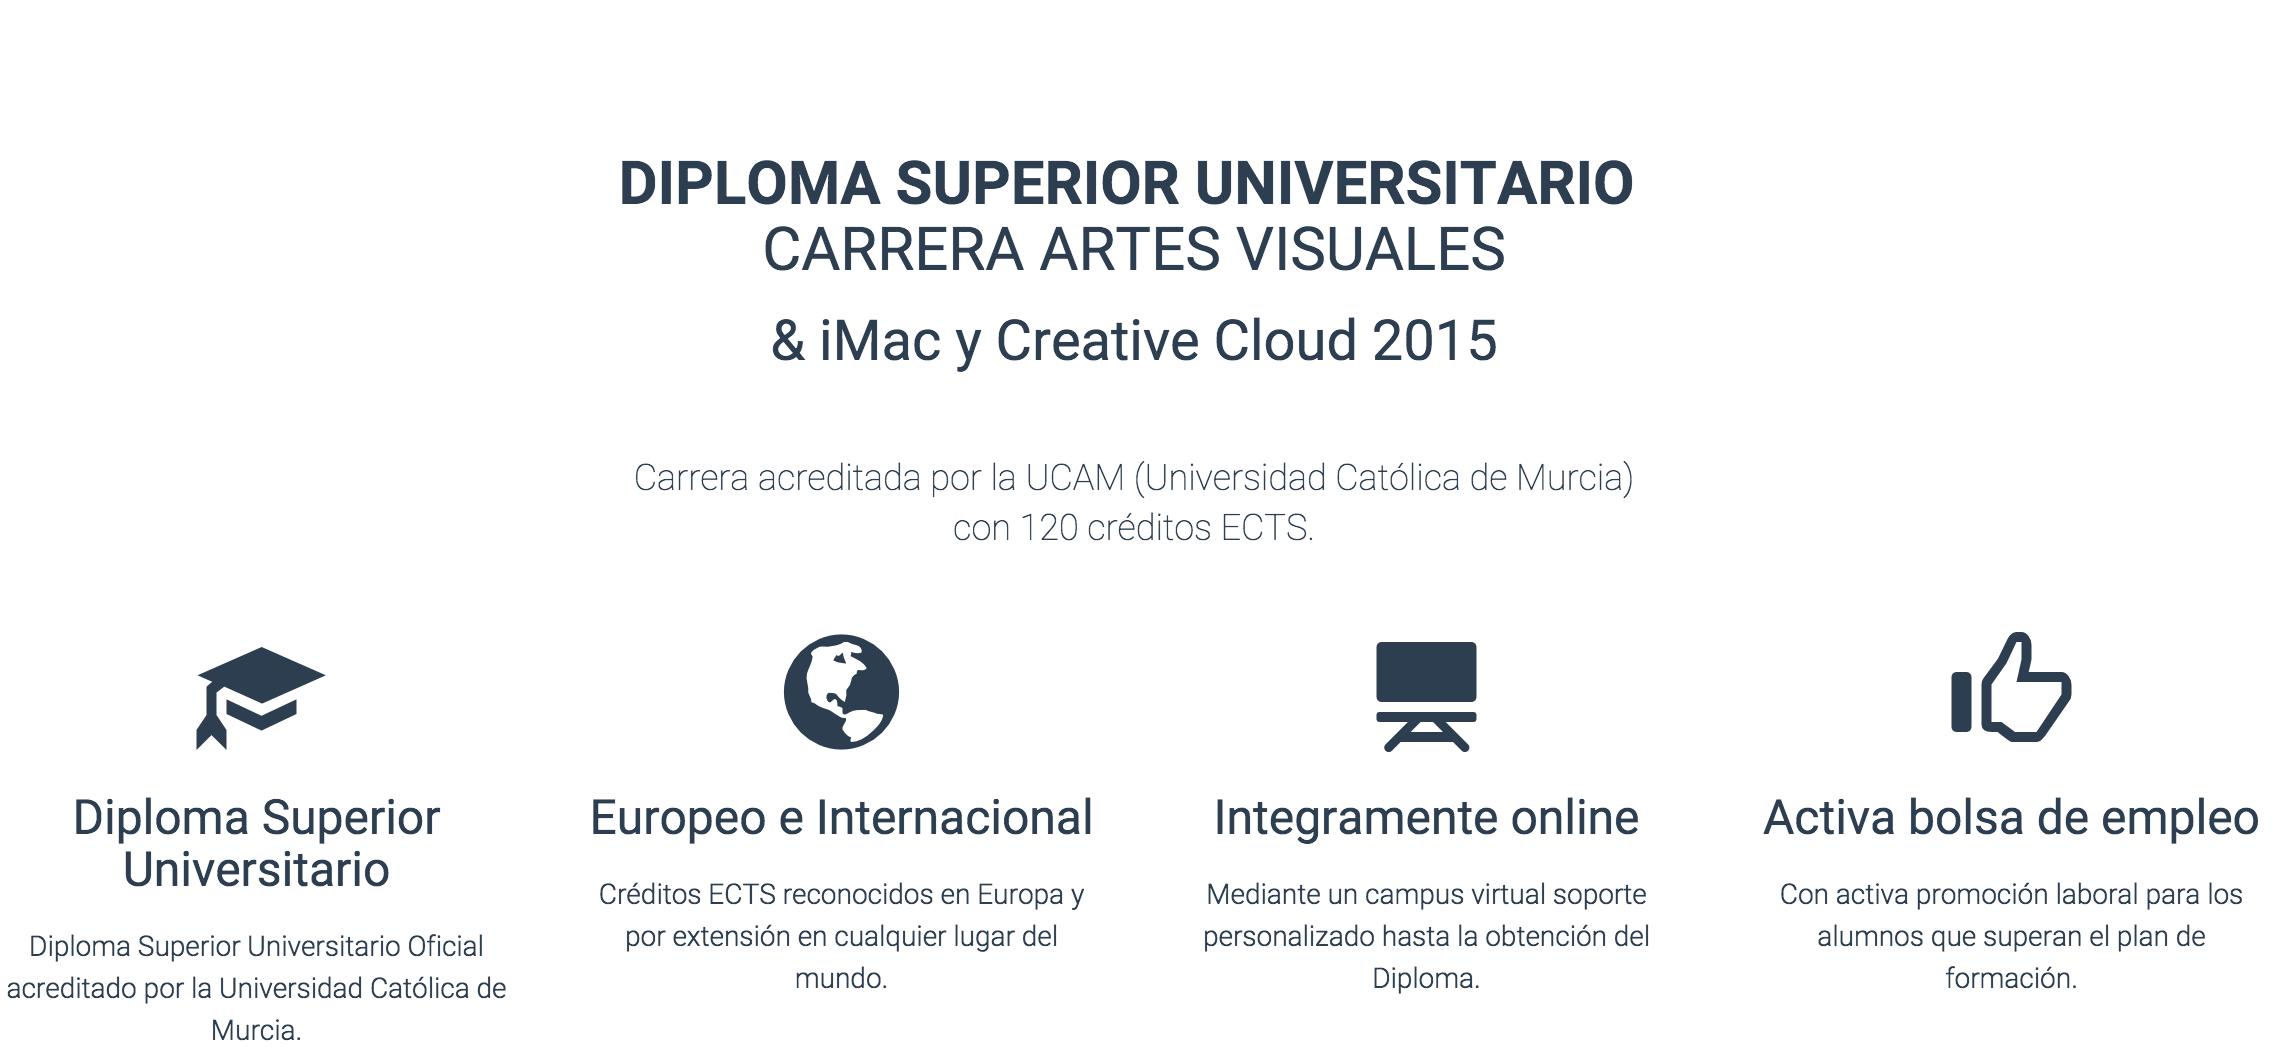 diploma_superior_universitario_CAV